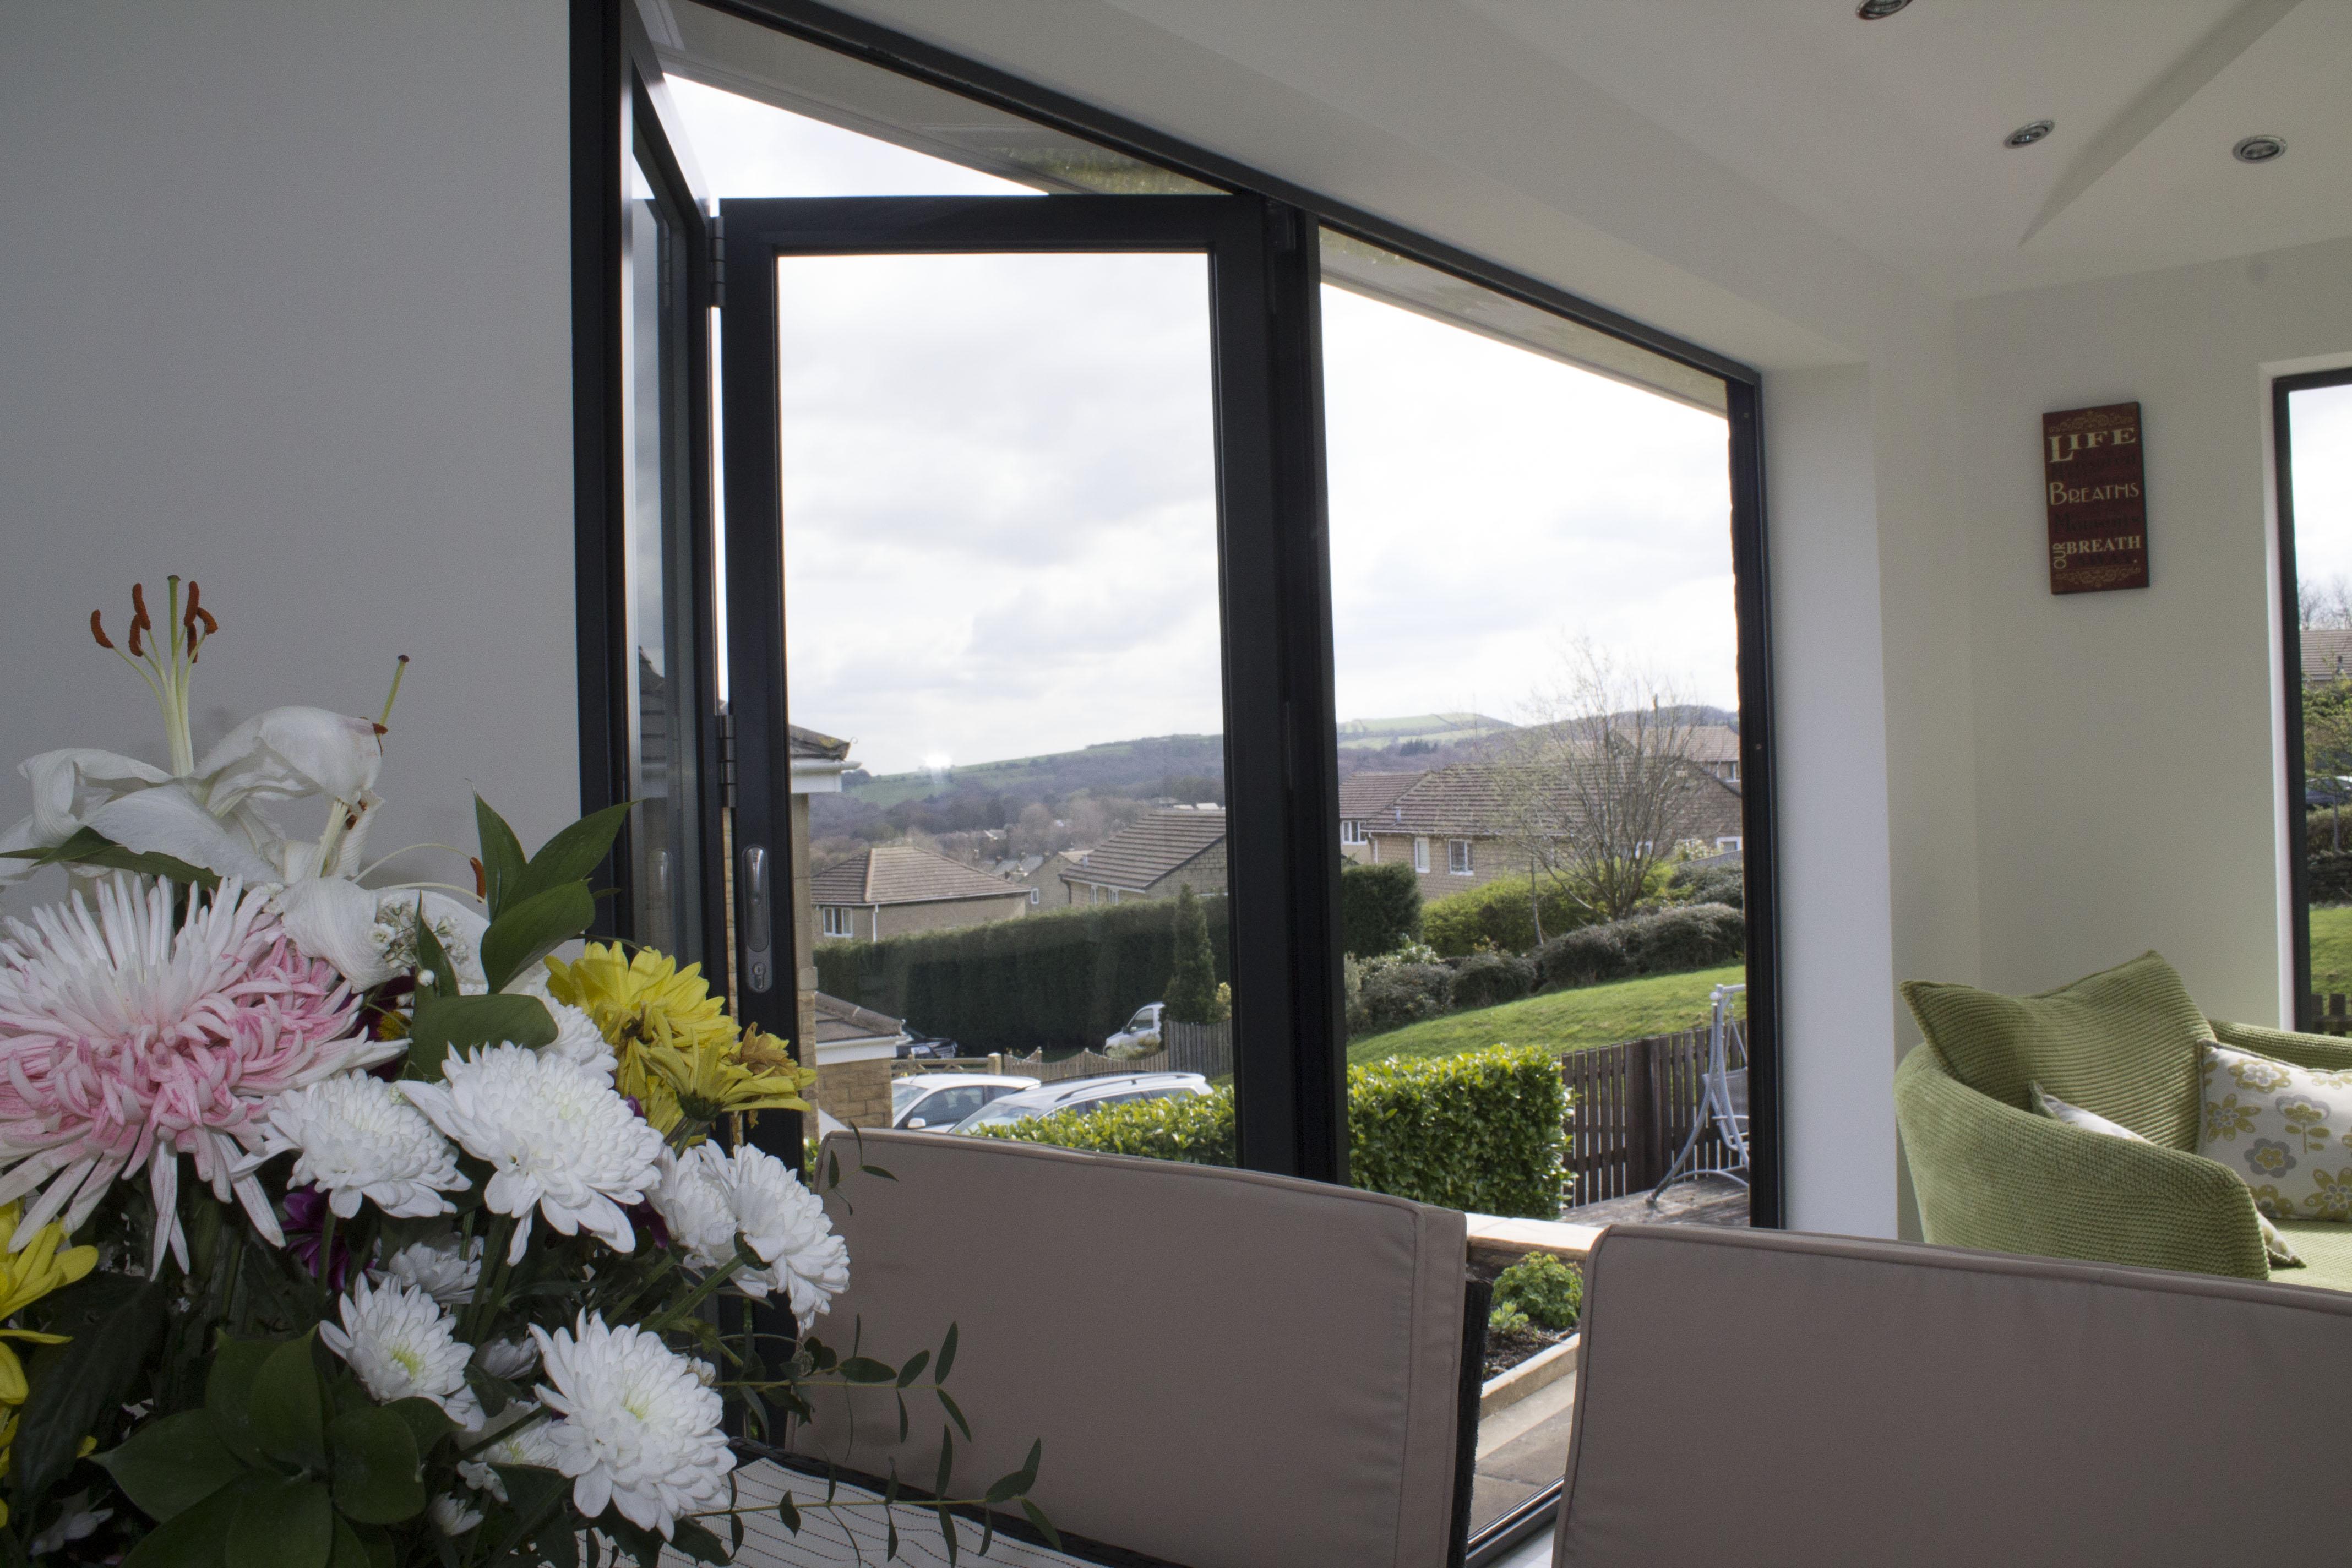 Gallery of Recent Projects & Bi-folding | Bi-fold | Folding | Aluminium | Doors | Yorkshire | UK ...